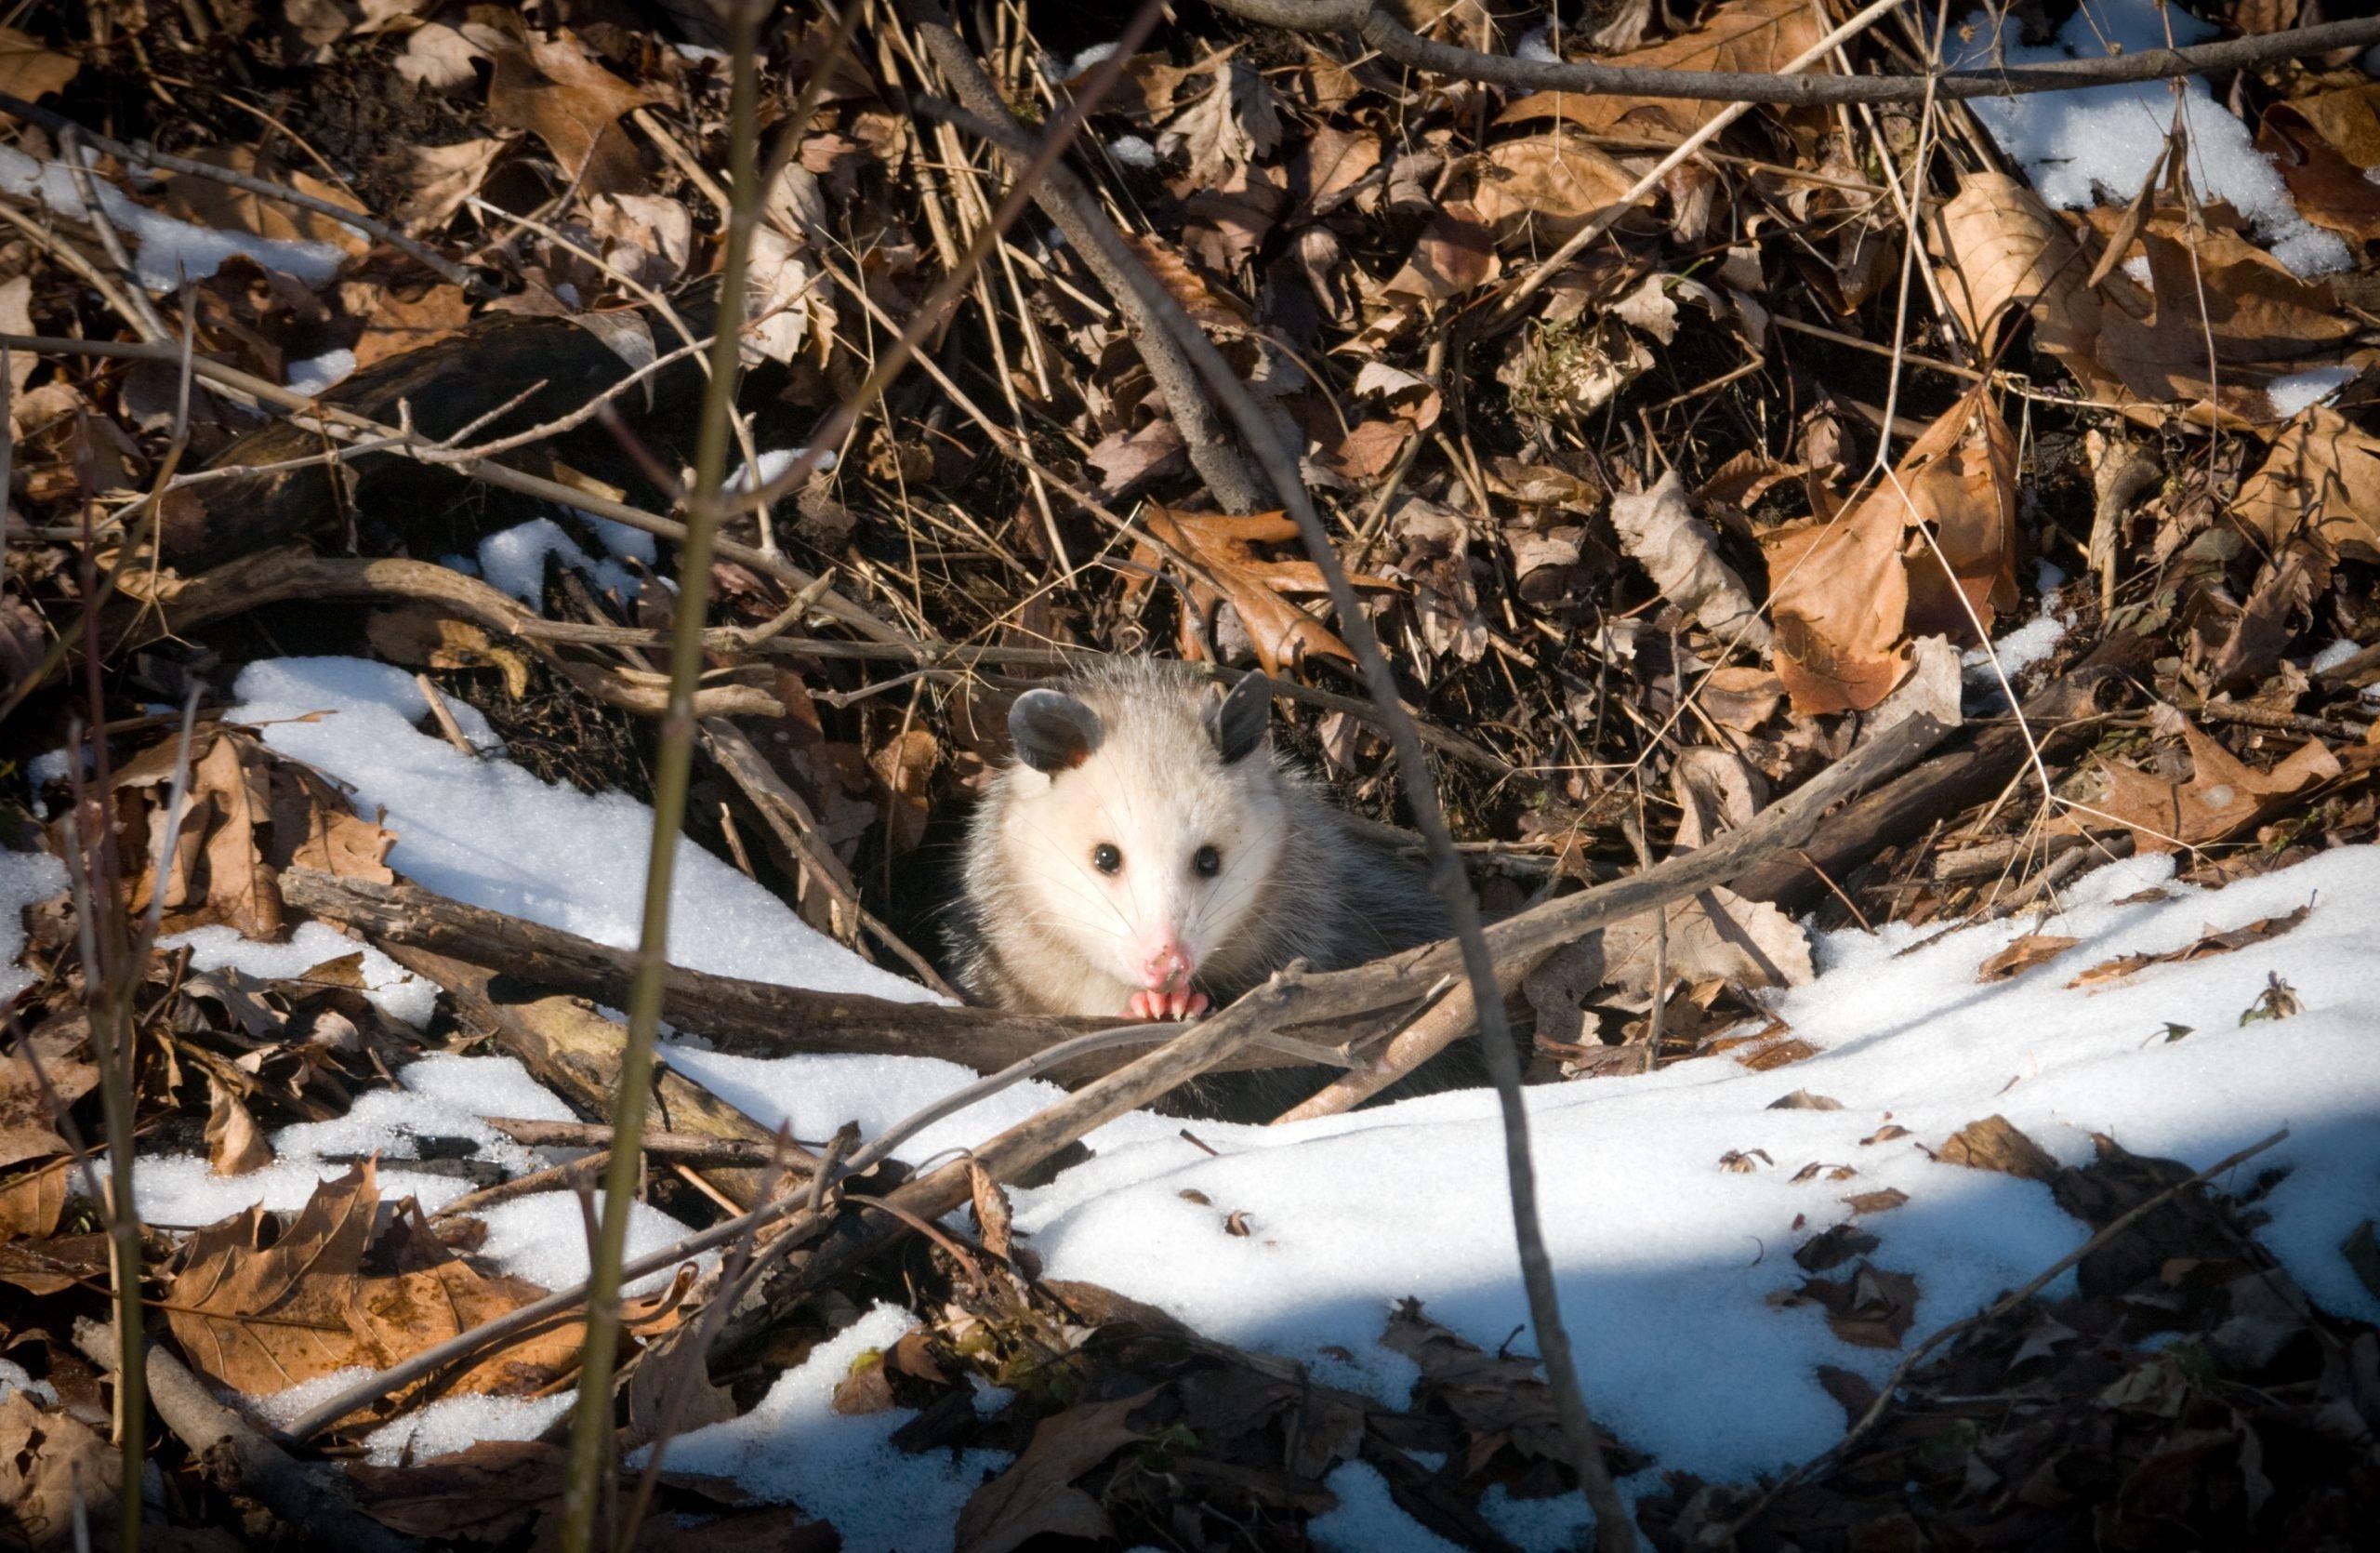 Opossum Peeking From Its Hole